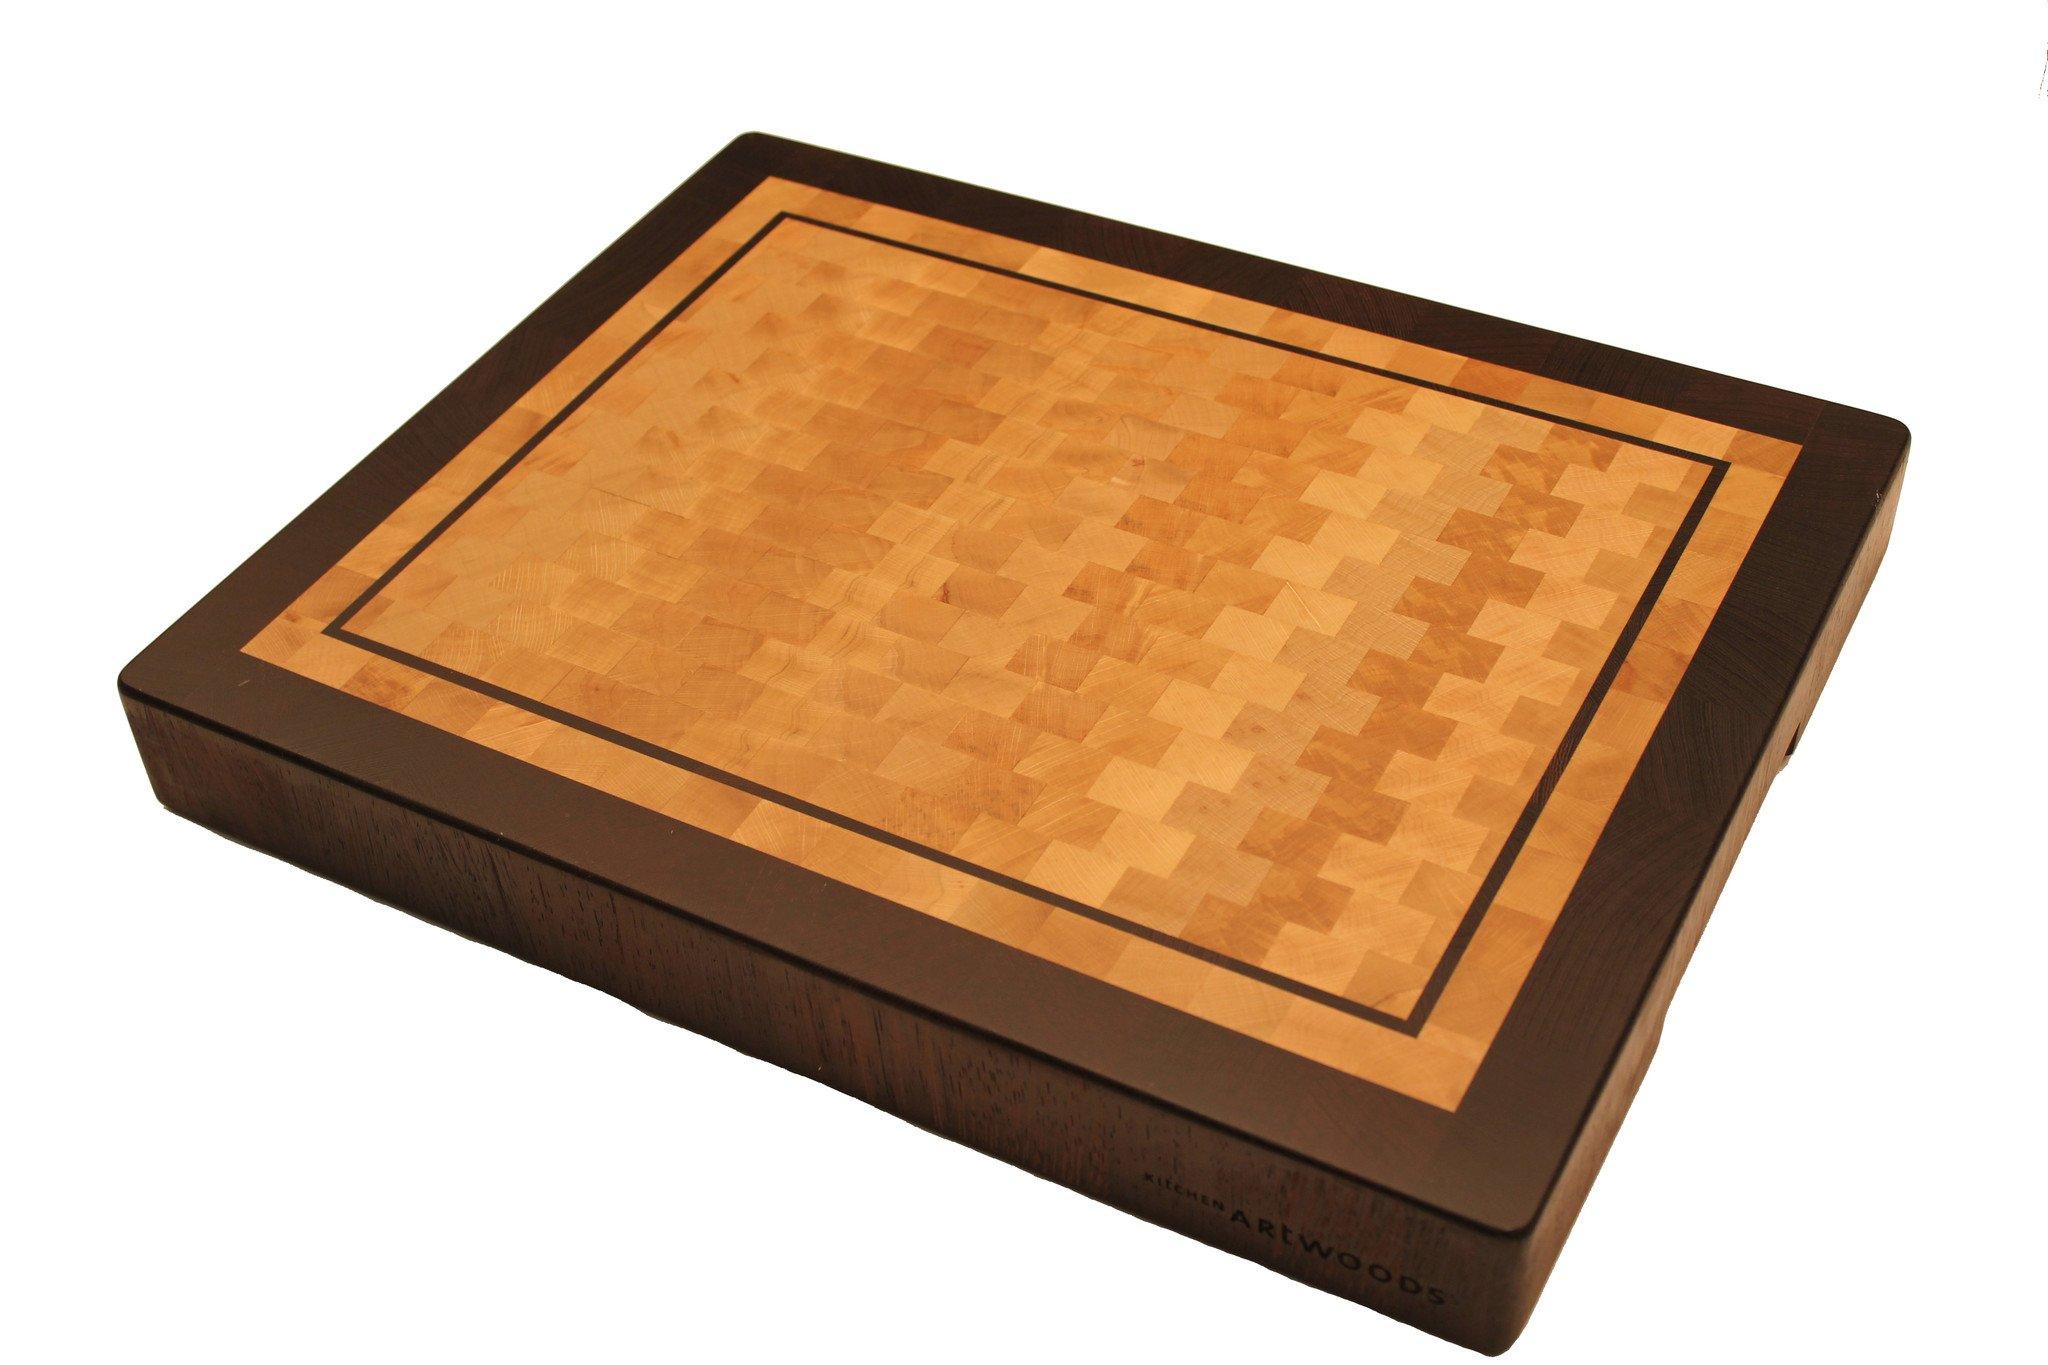 end grain cuttingboard made of hornbeam and wenge